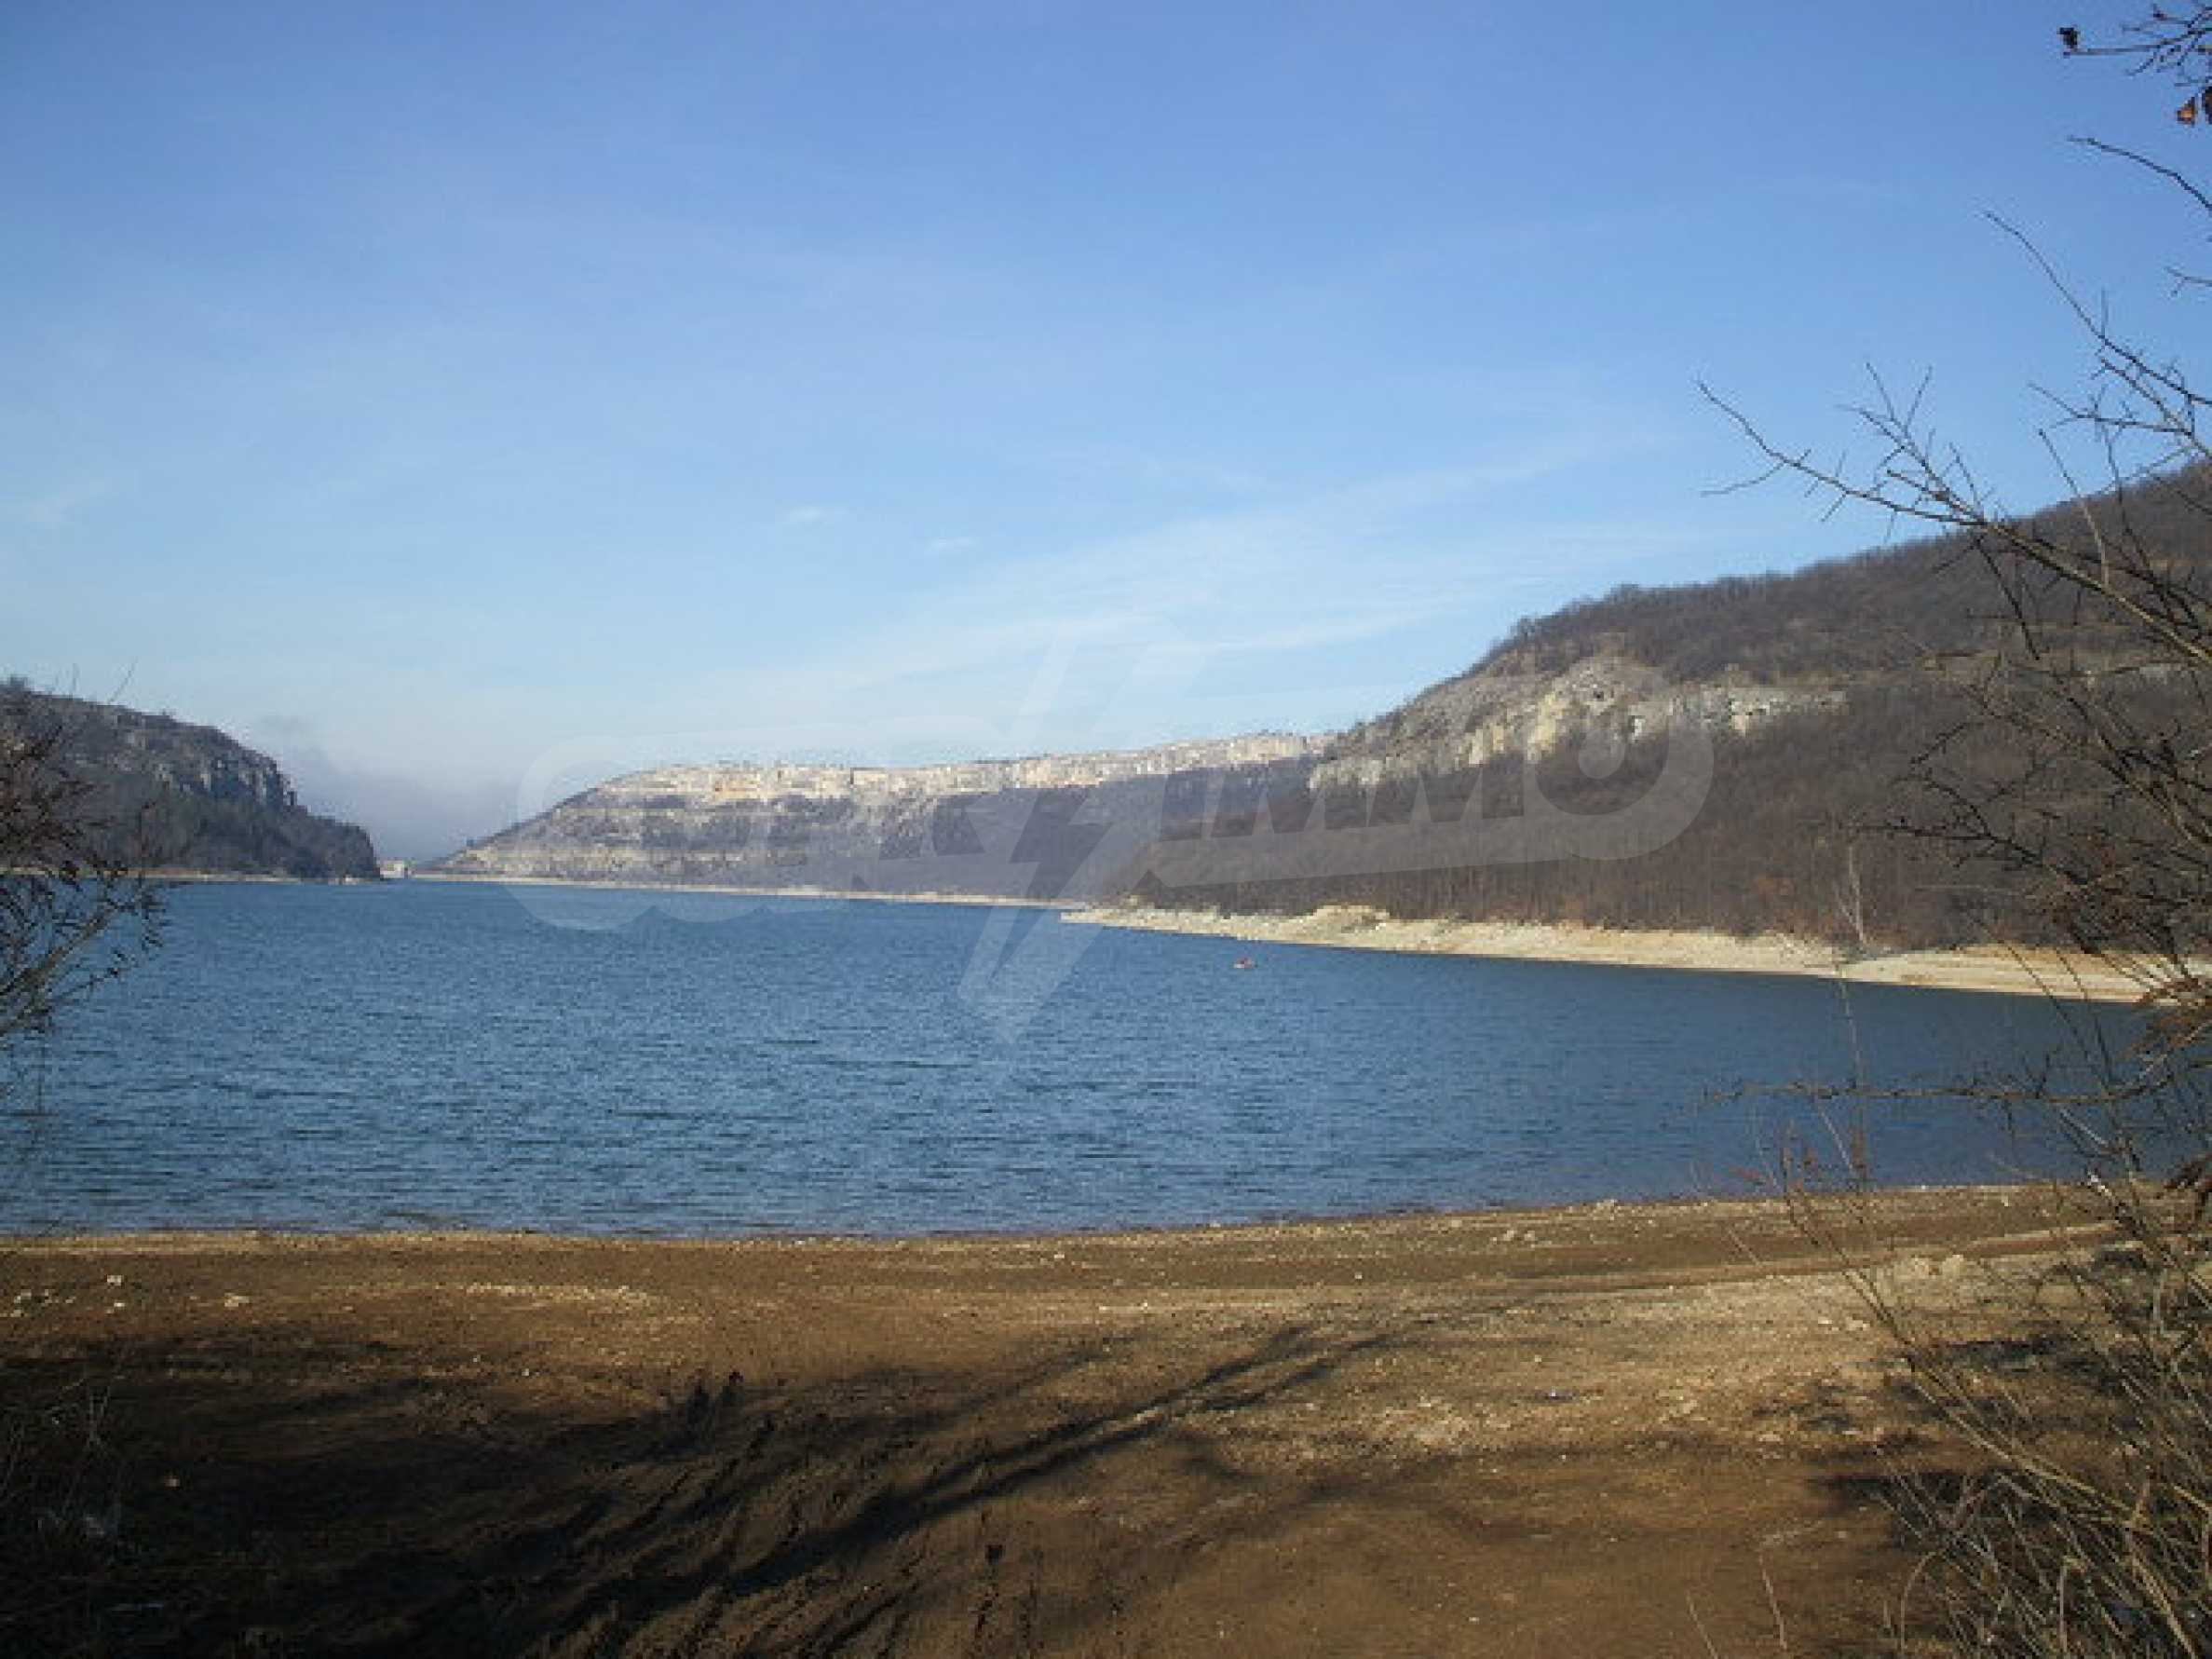 Land in regulation near Lake Alexander Stamboliyski 3